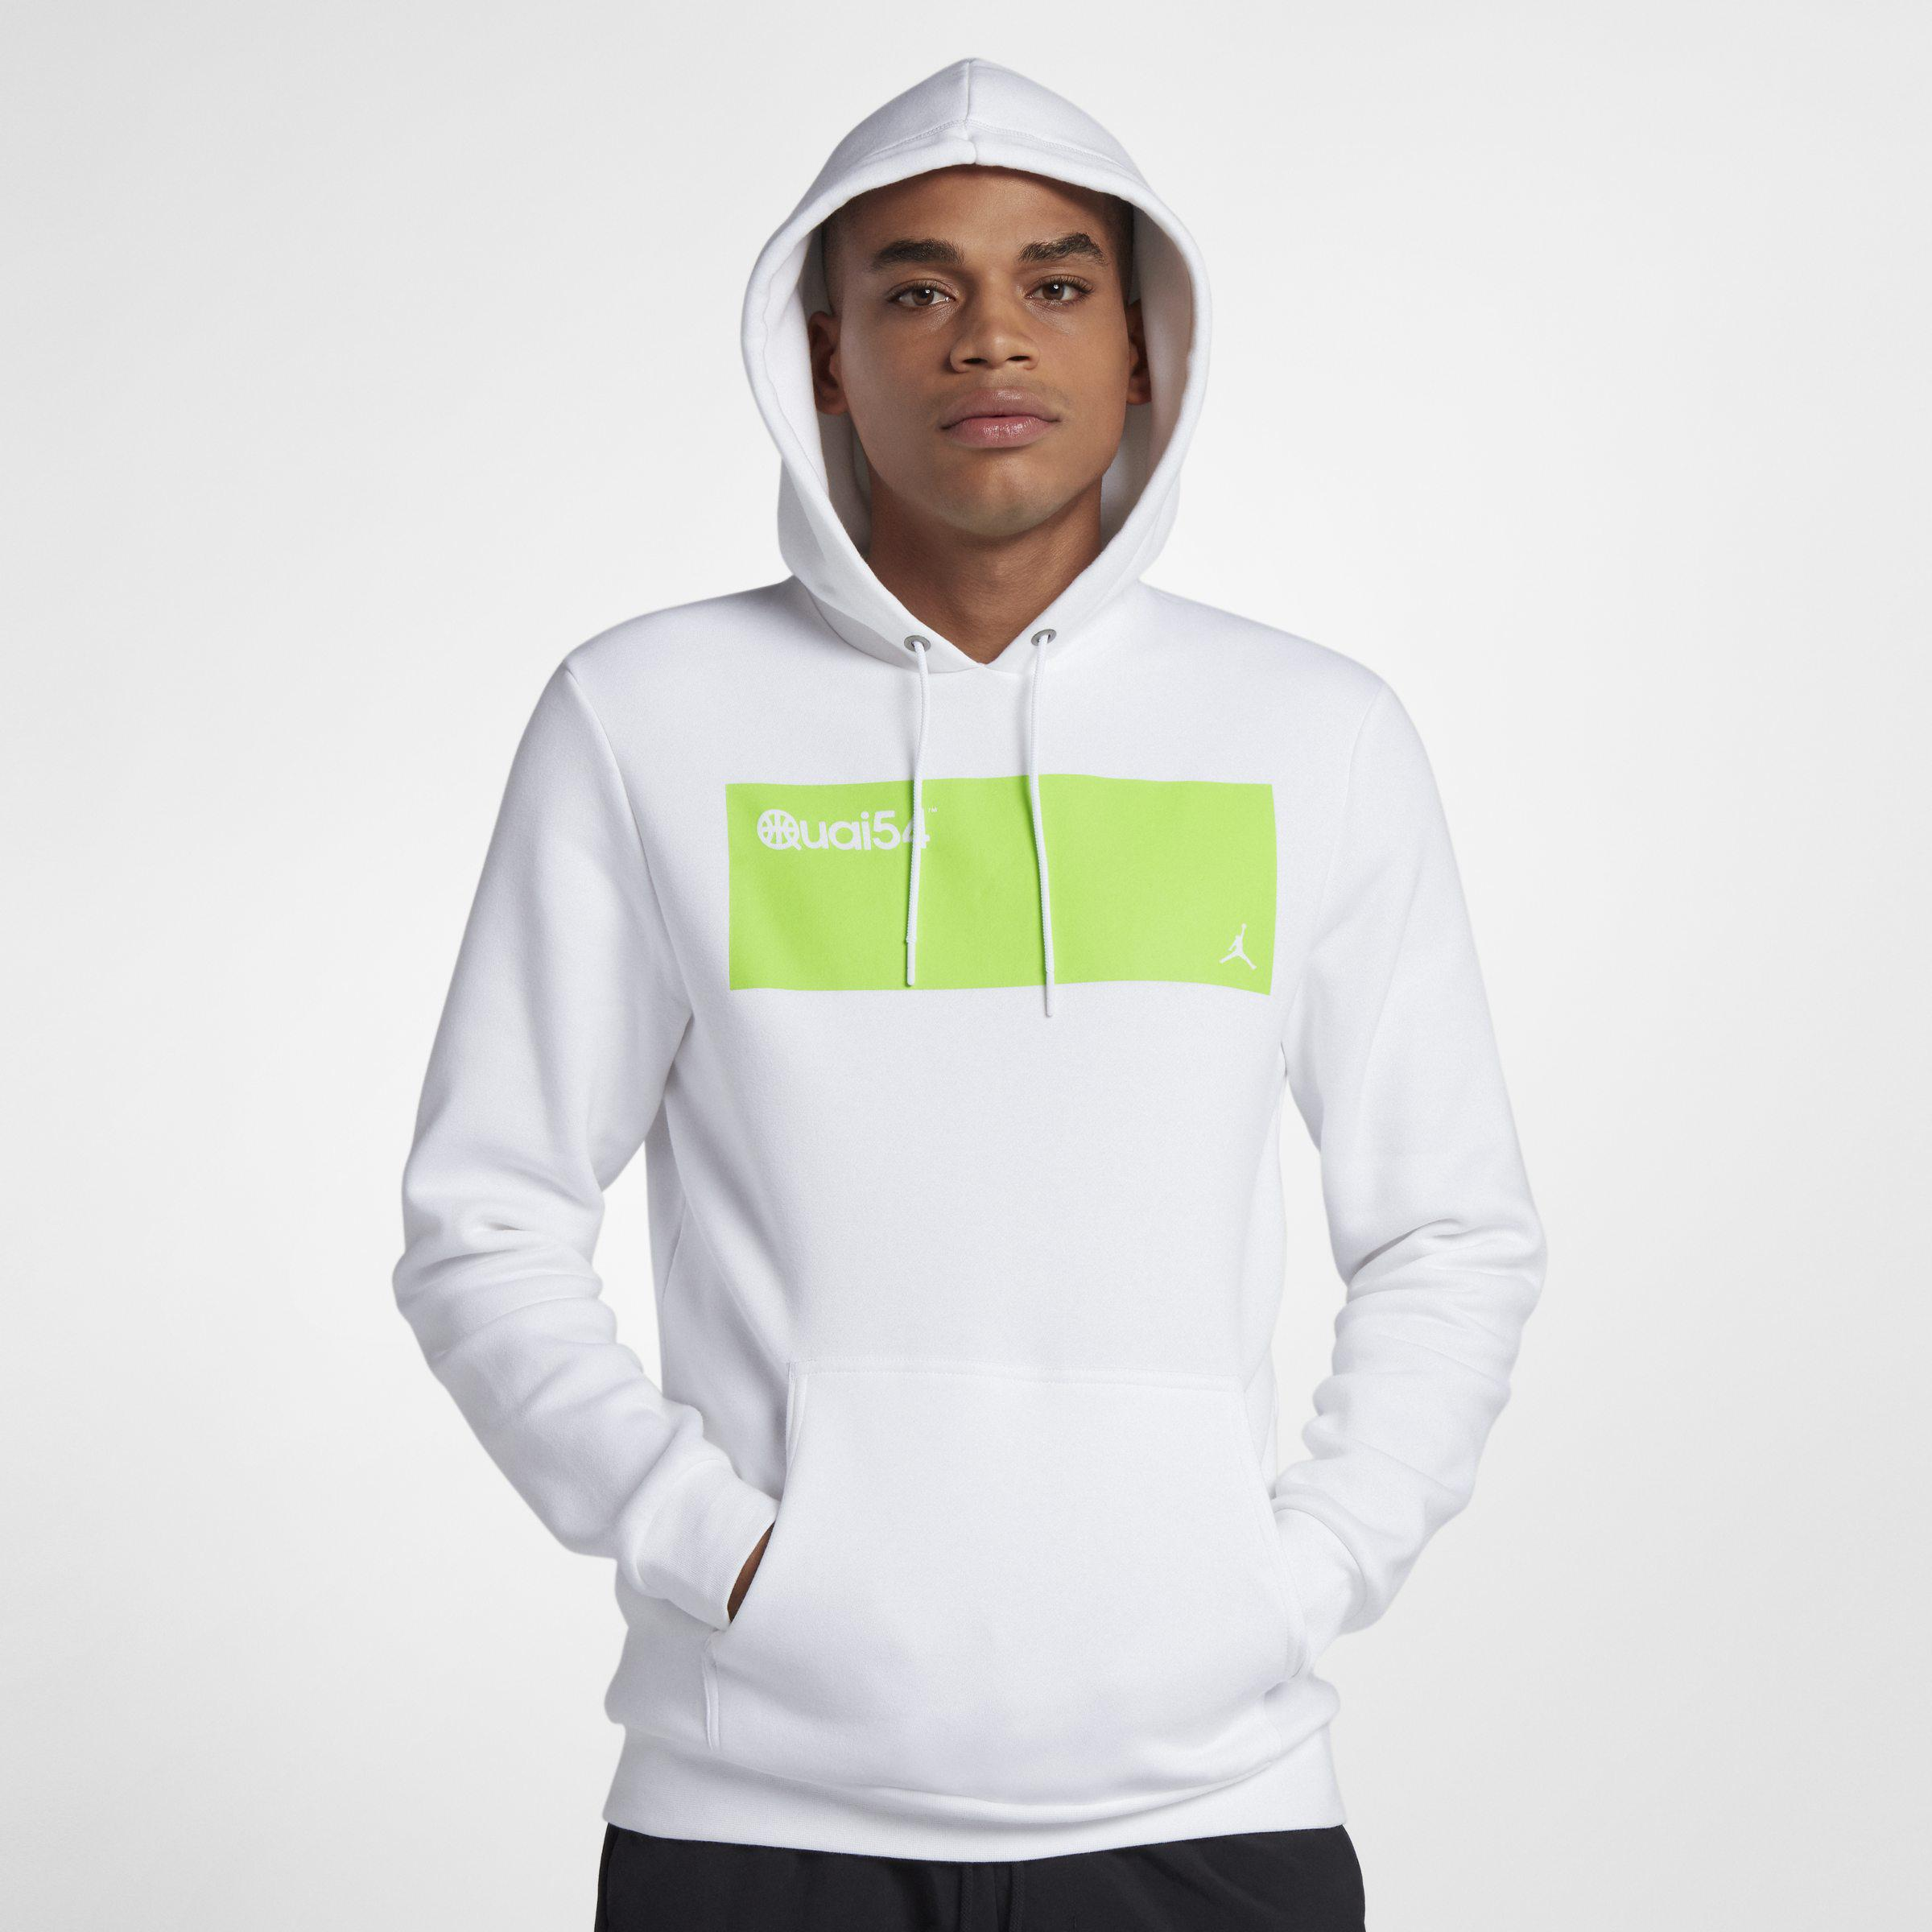 7b554bc47ef9 Nike Jordan Sportswear Quai 54 Fleece Pullover Hoodie in White for ...